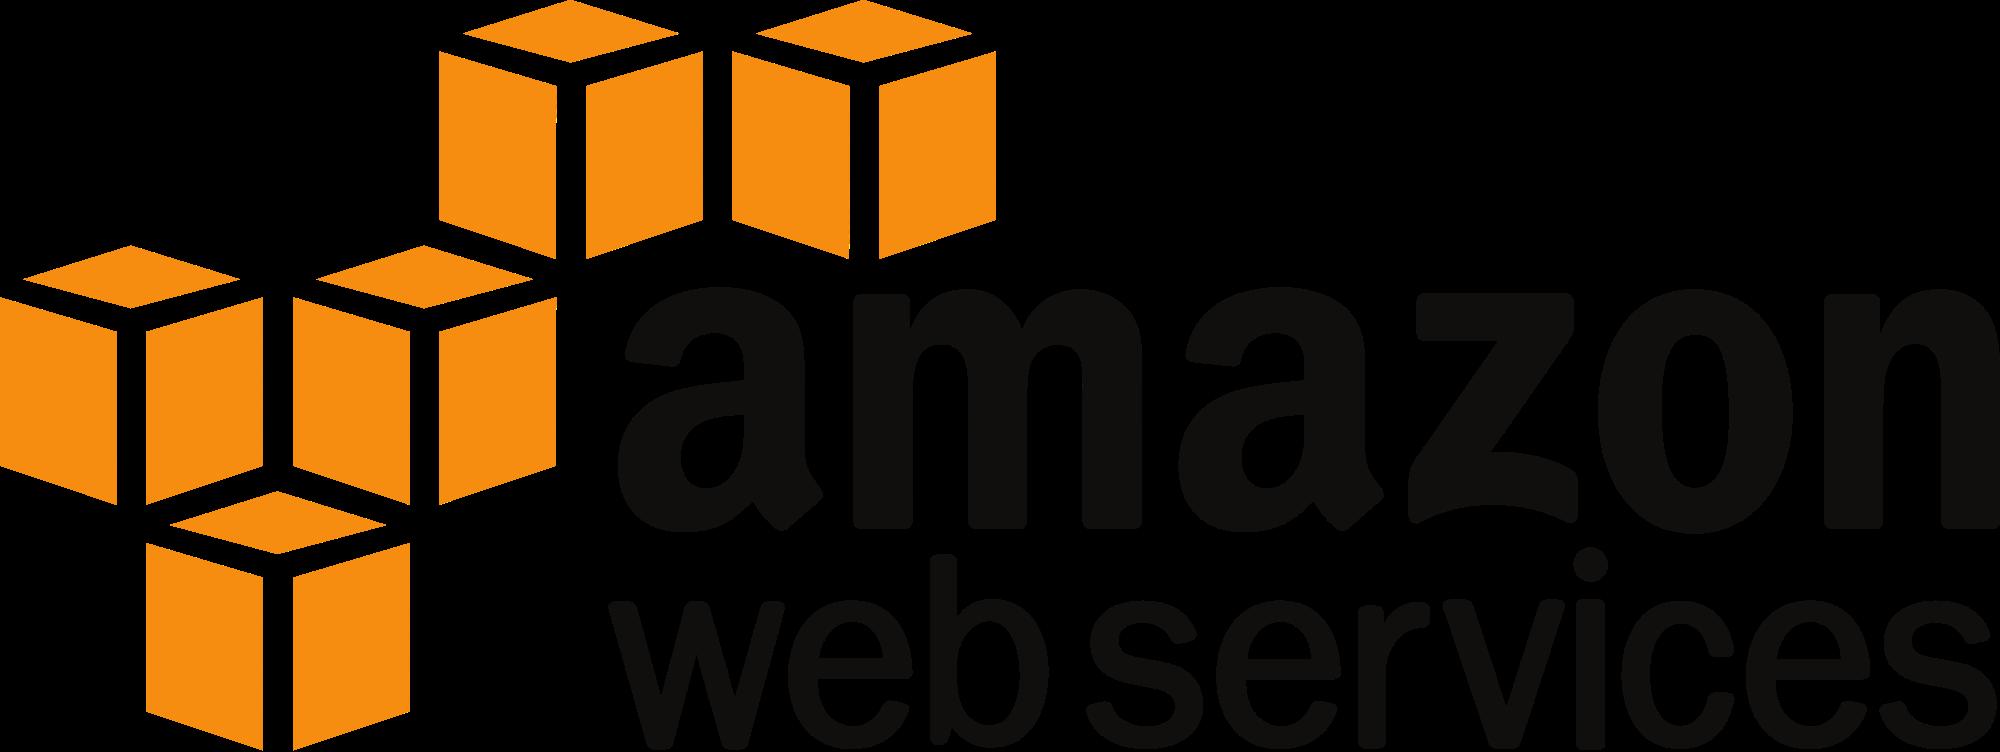 Amazon Web Services Lambda logo